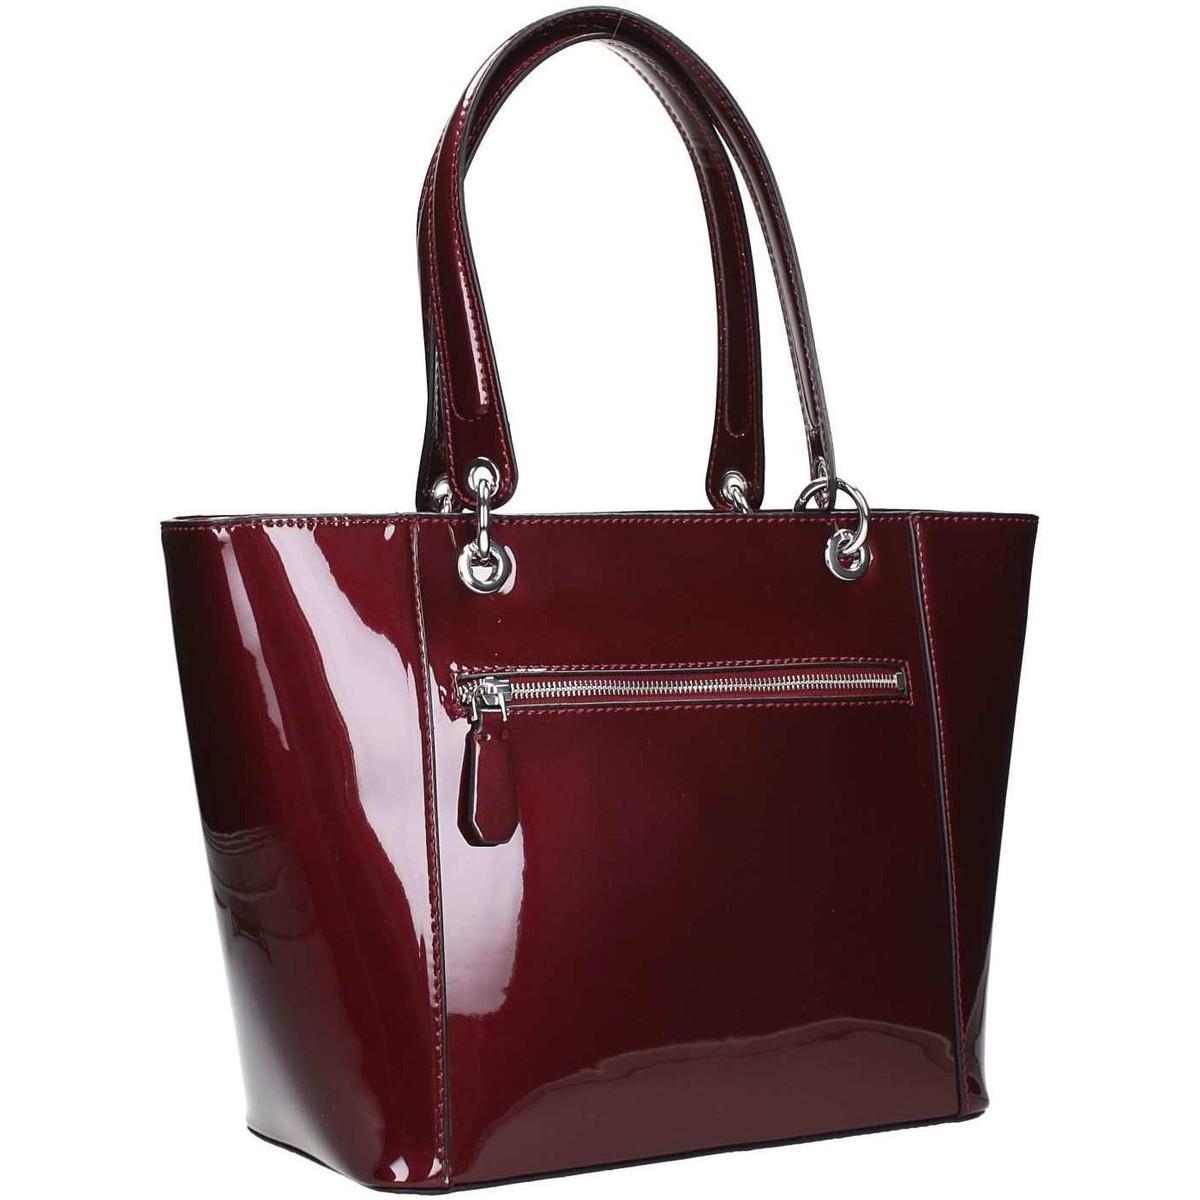 4844dcca429e Guess Hwpt66 91230 Shopping Bag Women s Shopper Bag In Red in Red - Lyst